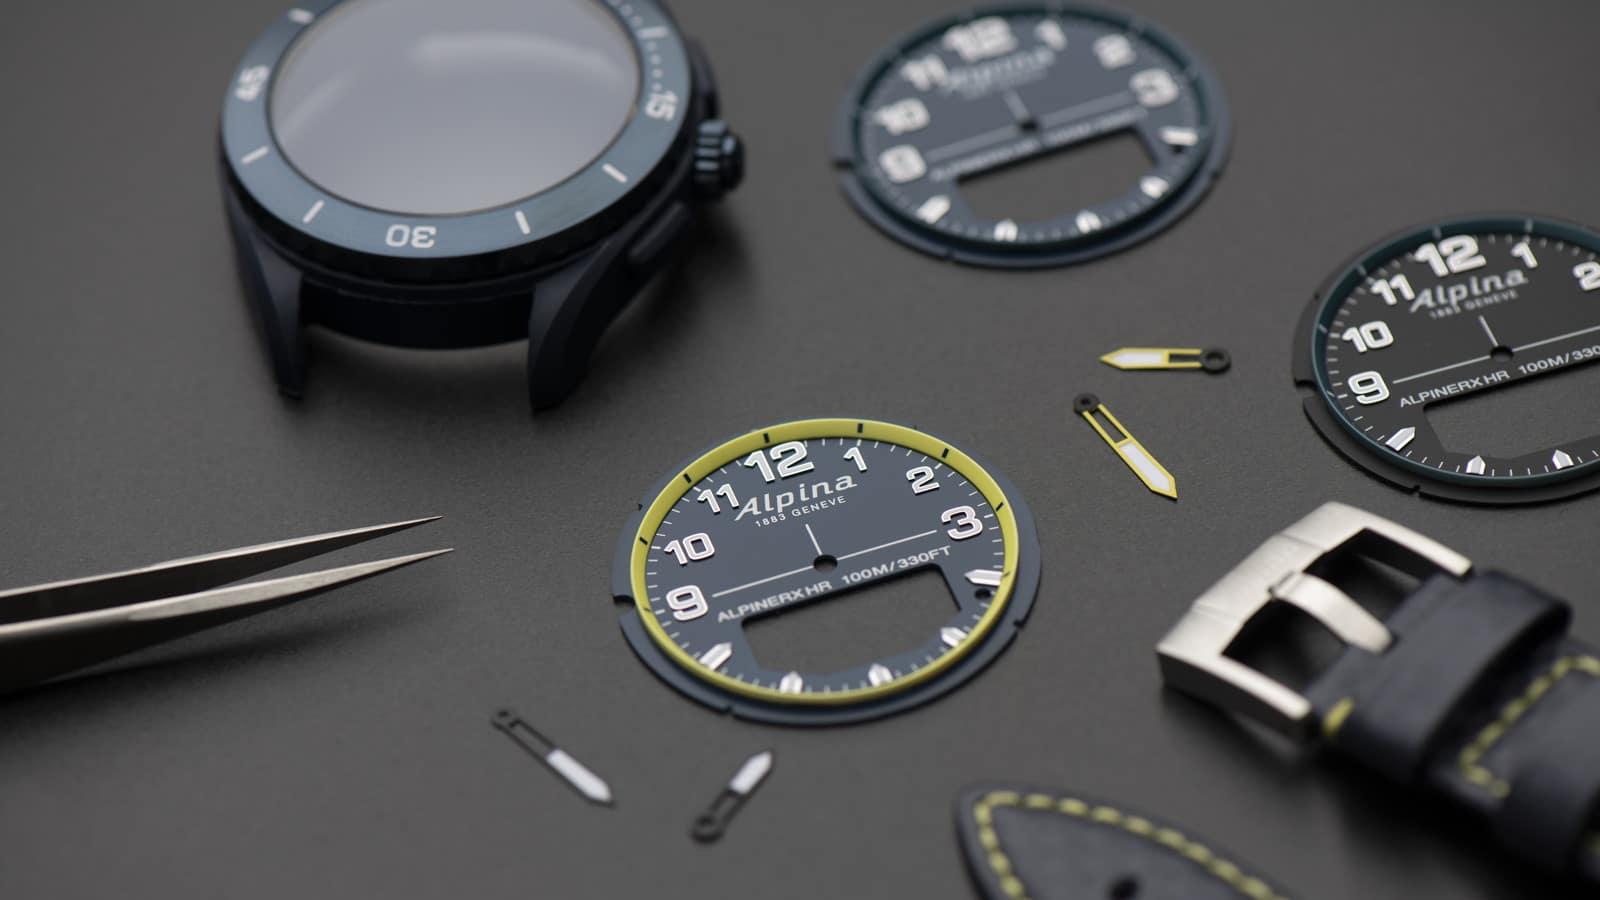 alpinerx smartwatch